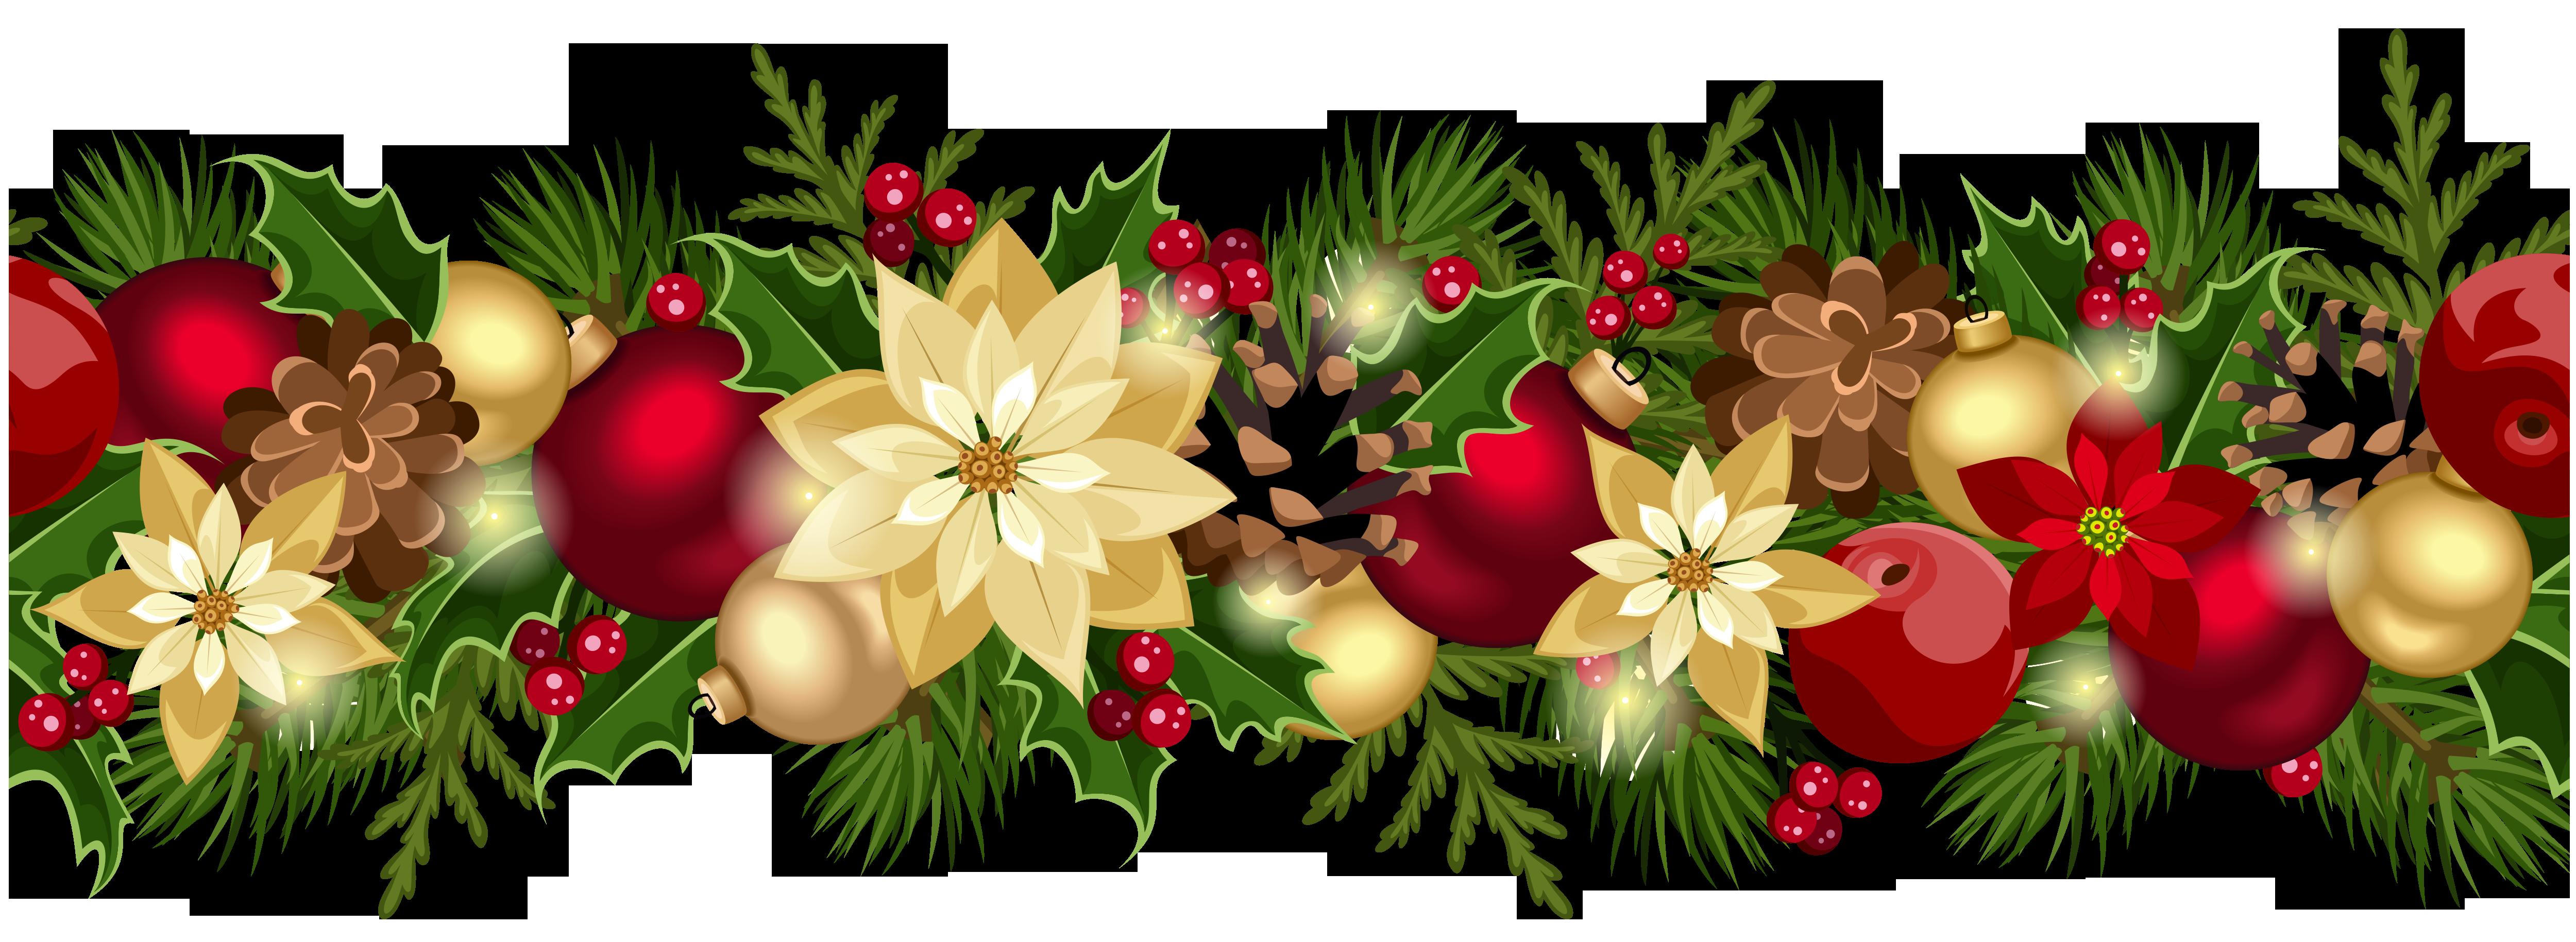 banner royalty free download Christmas decorations clipart borders. Decorative garland xmasblor galleryyopricevillecom